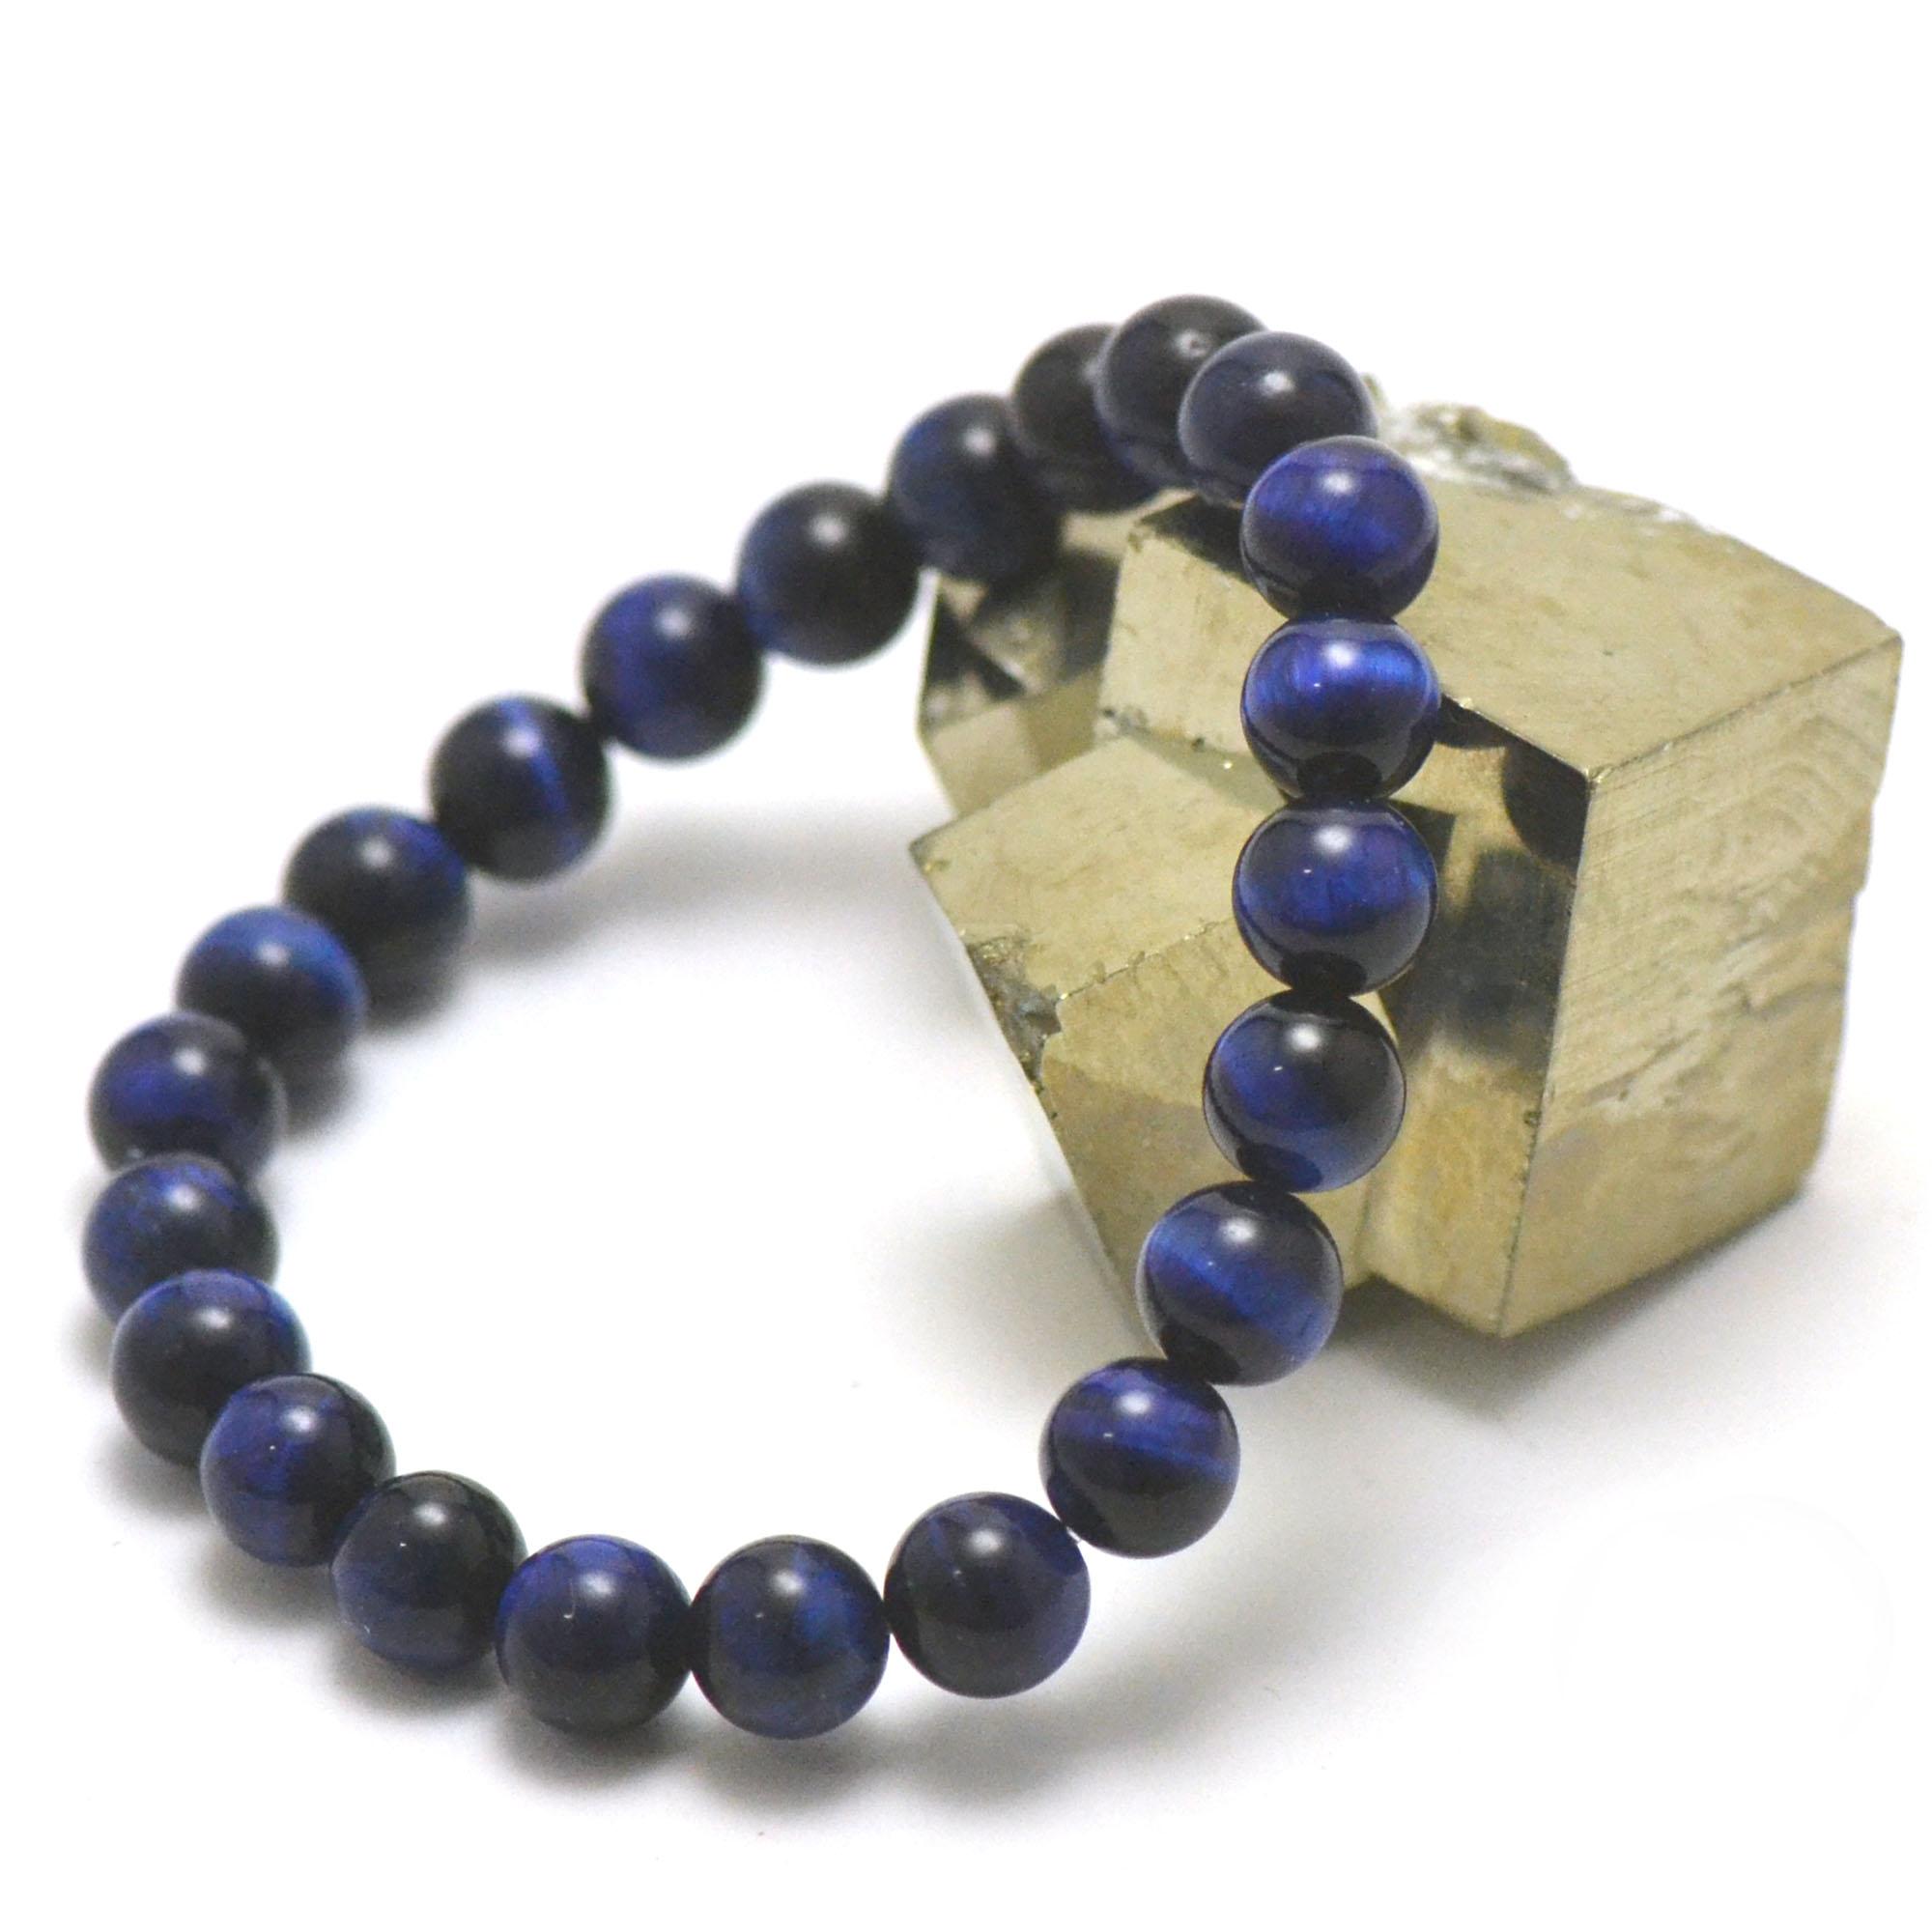 Bracelet oeil de tigre bleu perle ronde 8 mm